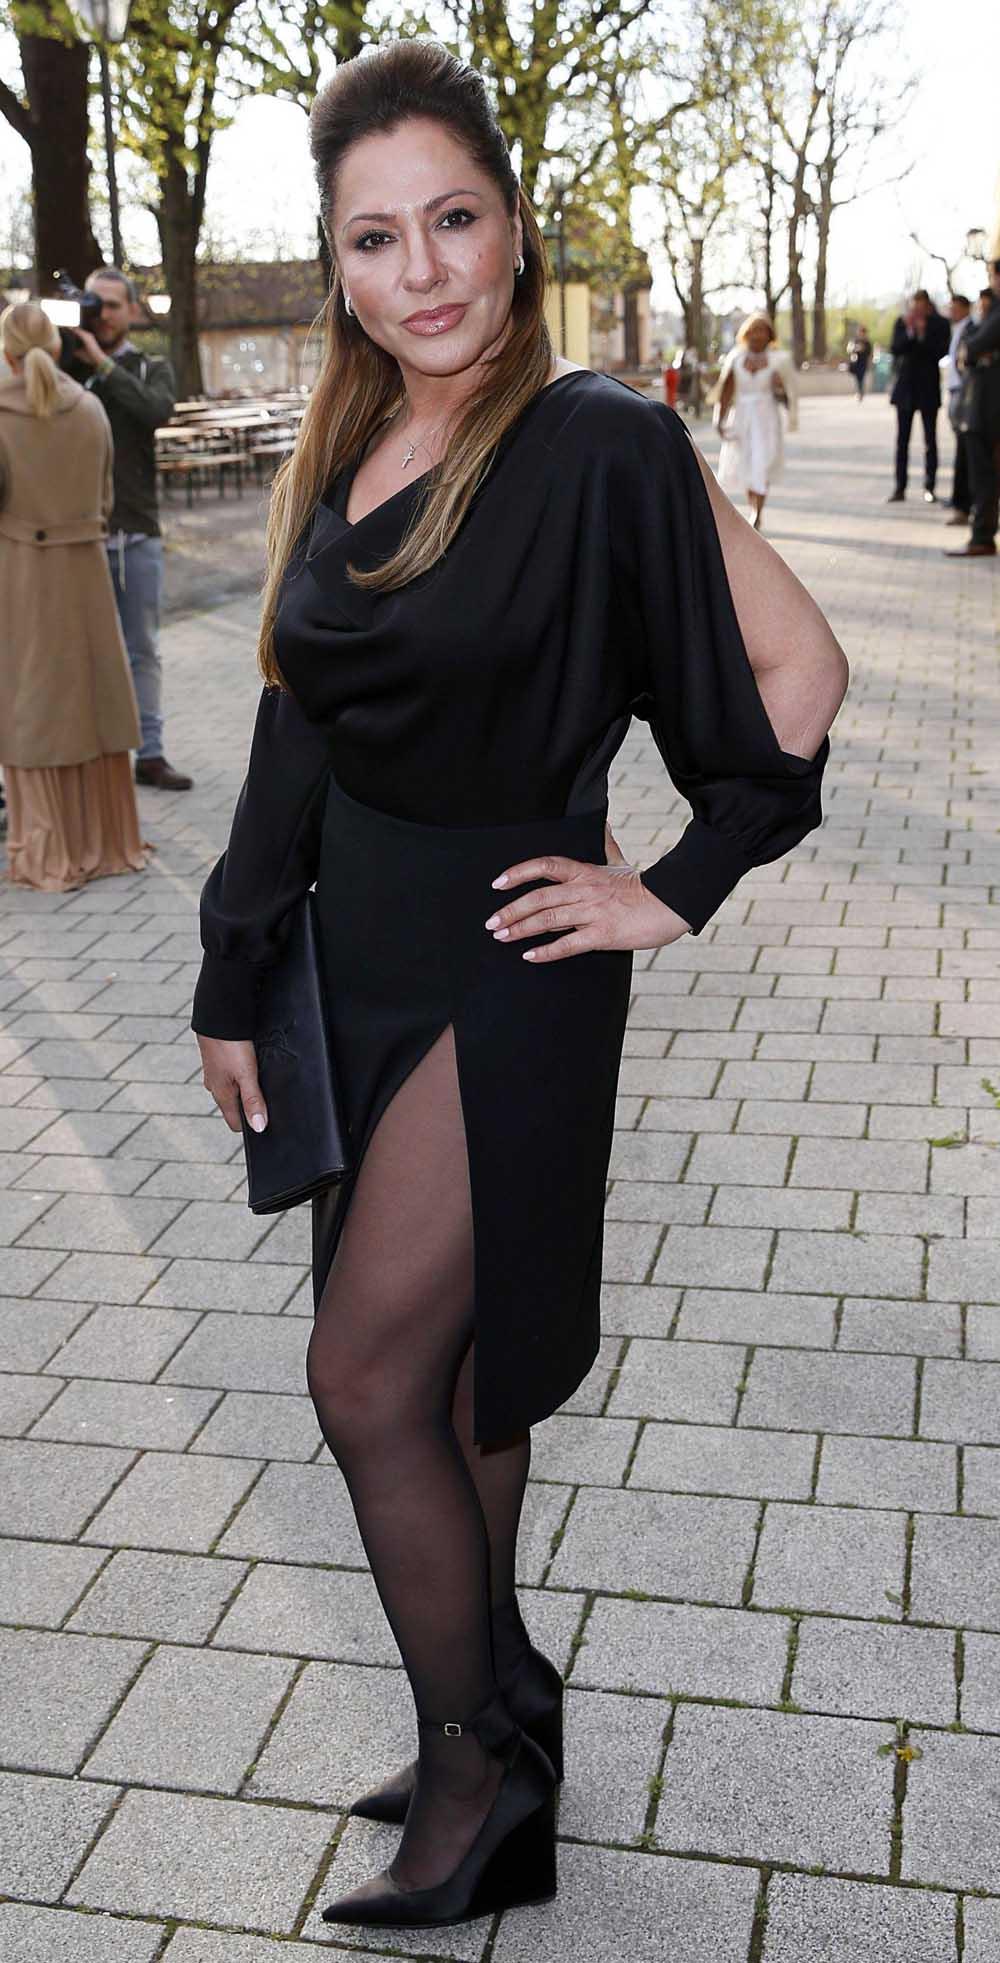 Simone Thomalla Nude » SexyStars.online - Hottest